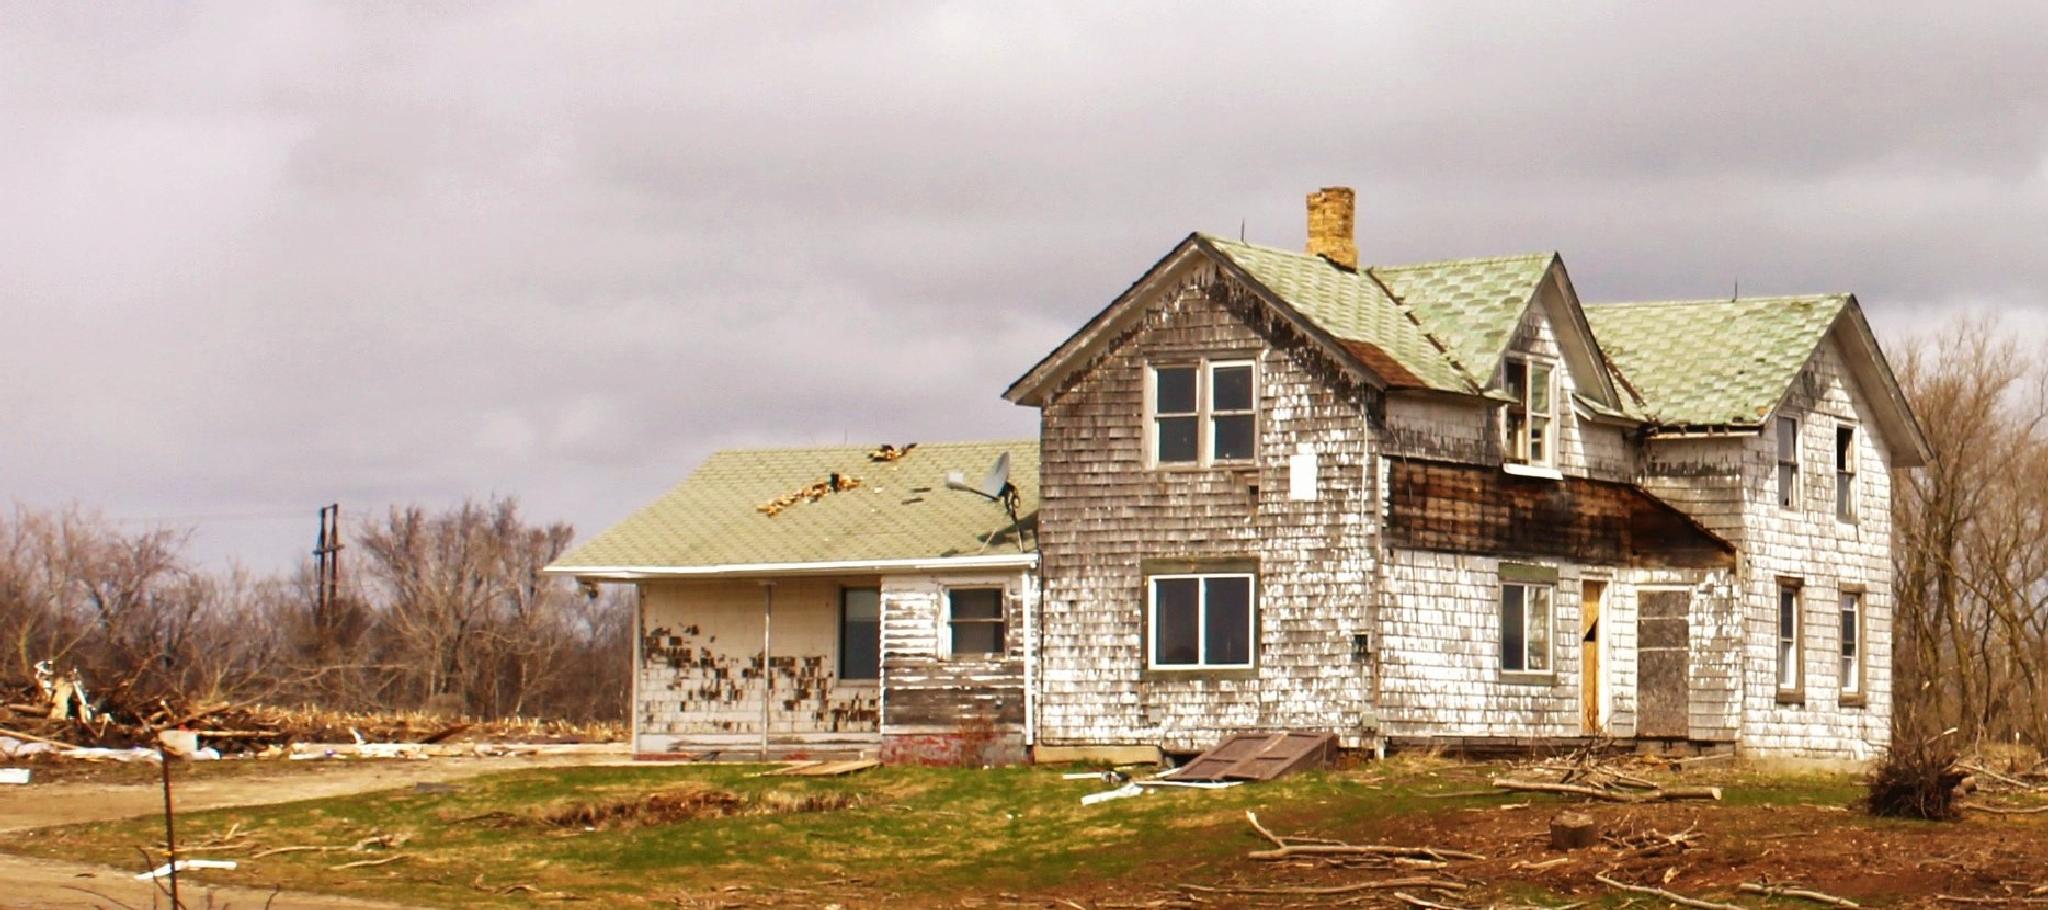 Abandoned Farm House by autumn.acres.1